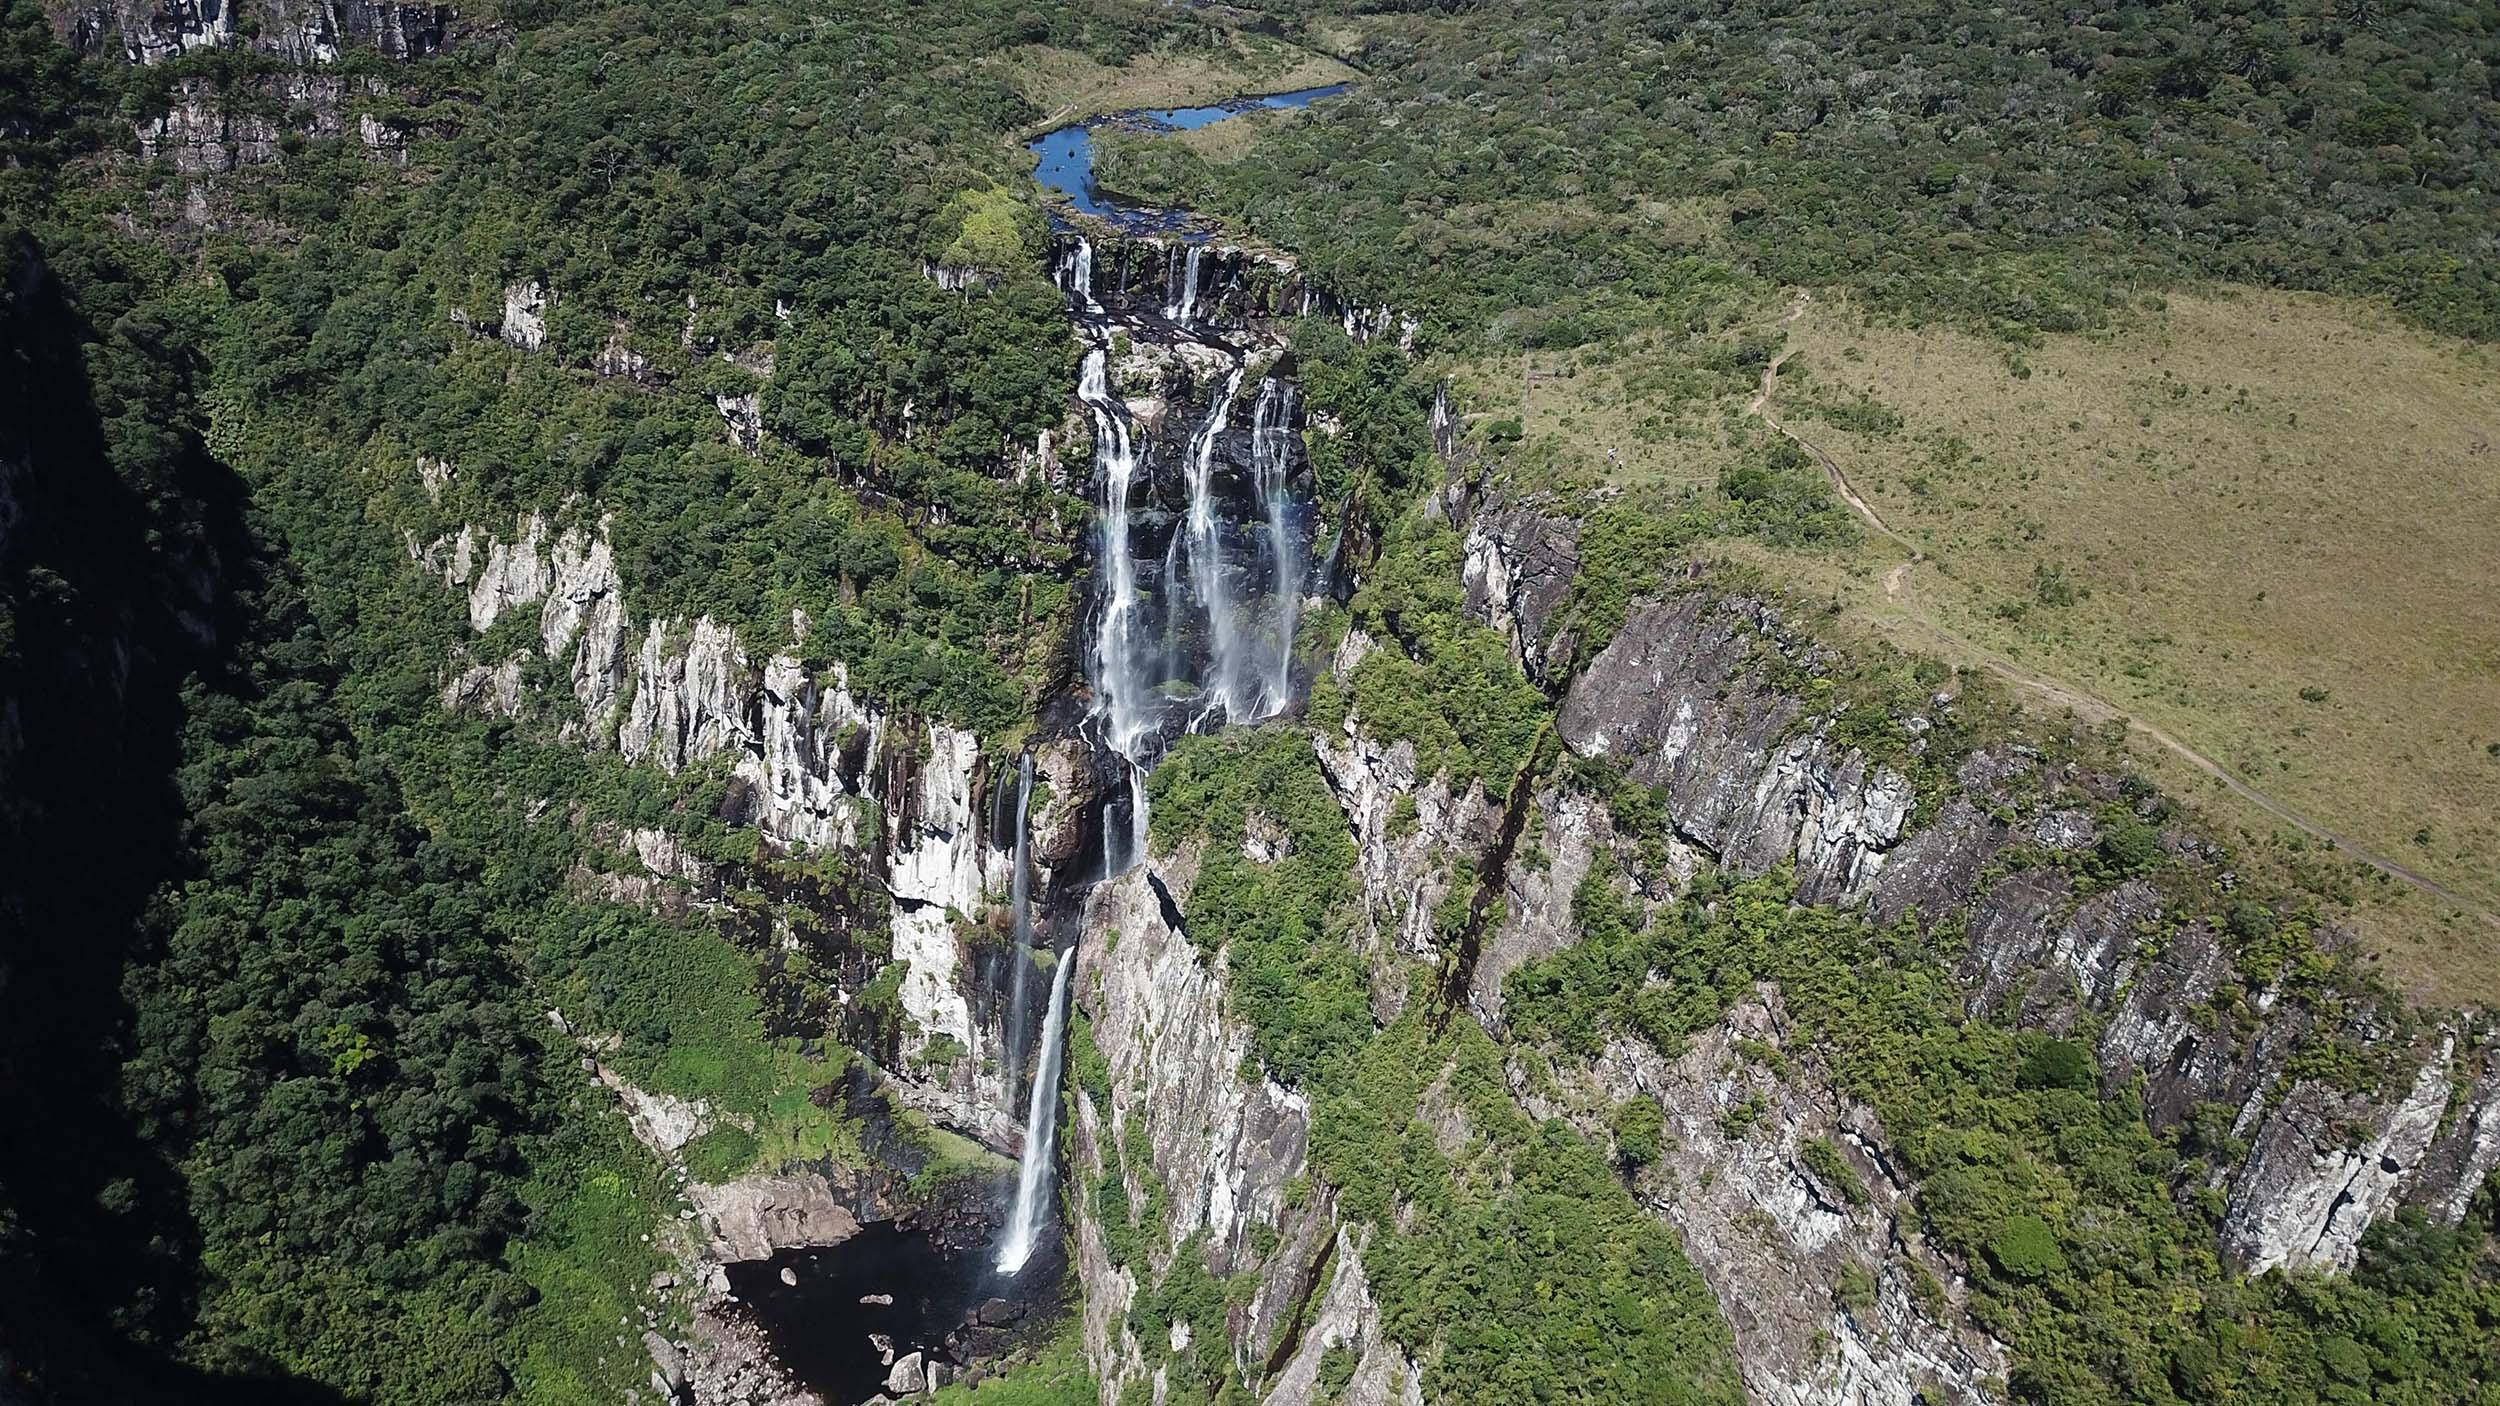 The Tigre Preto Waterfall - Brazil